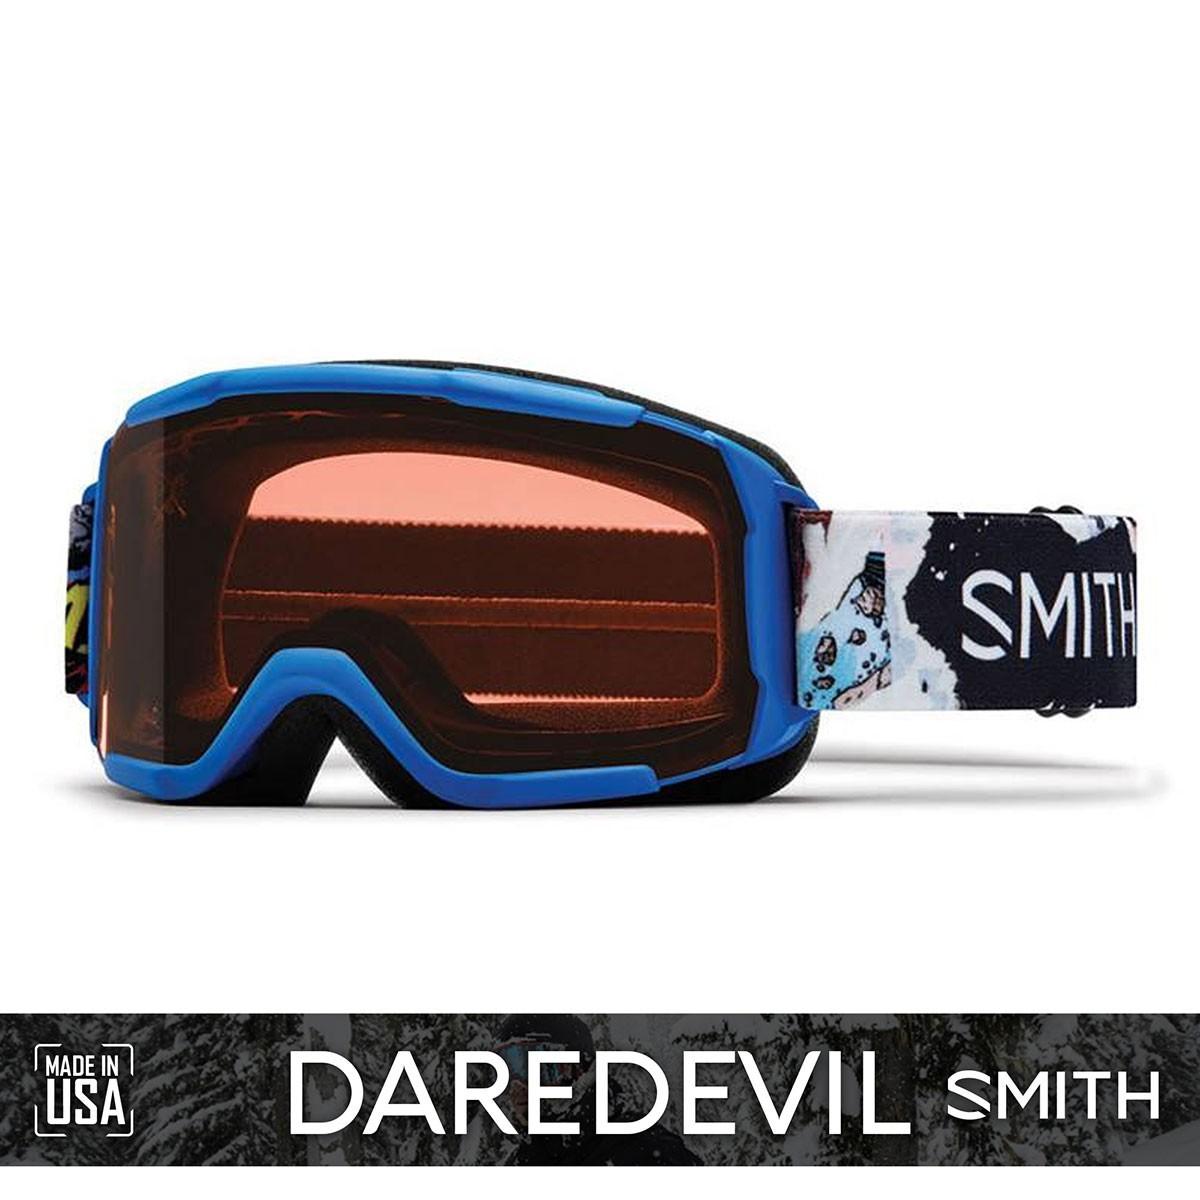 SMITH DAREDEVIL Lapisripcomi   S2 RC36 ROSEC - Изображение - AQUAMATRIX